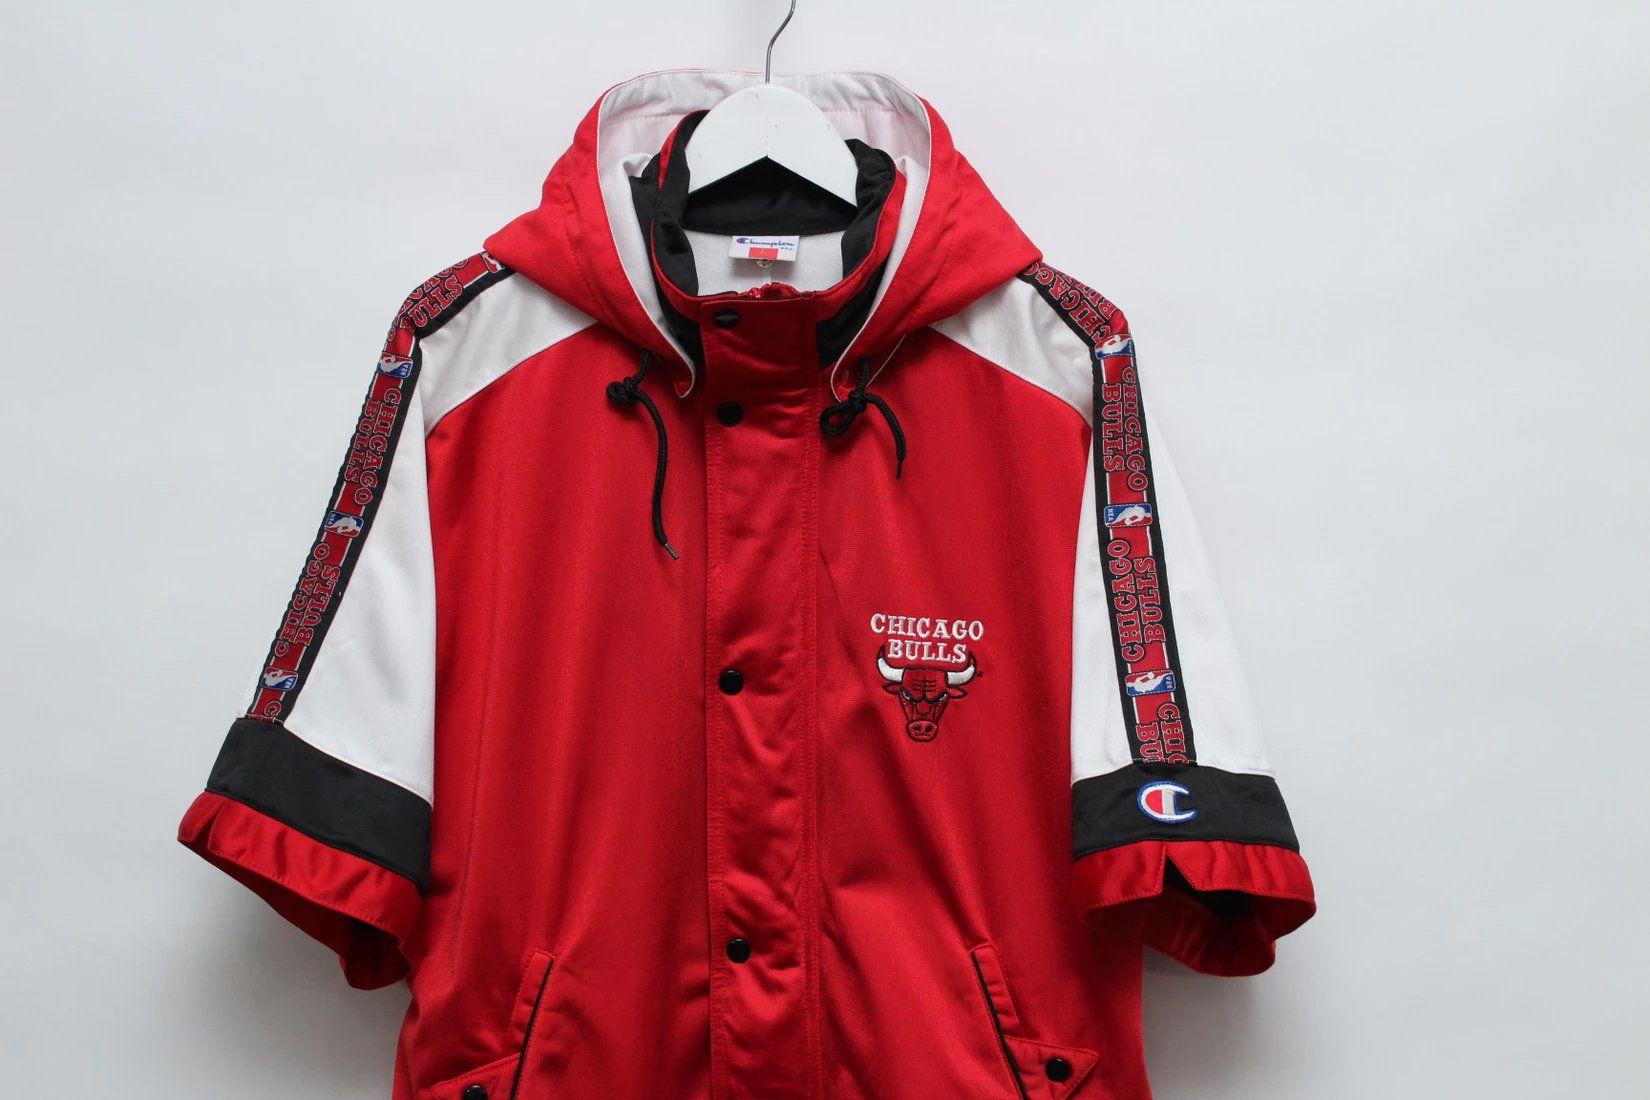 Champion Vintage Nba Chicago Bulls Warm Up Shooting Jacket Etsy In 2020 Nba Chicago Bulls Jackets Chicago Bulls